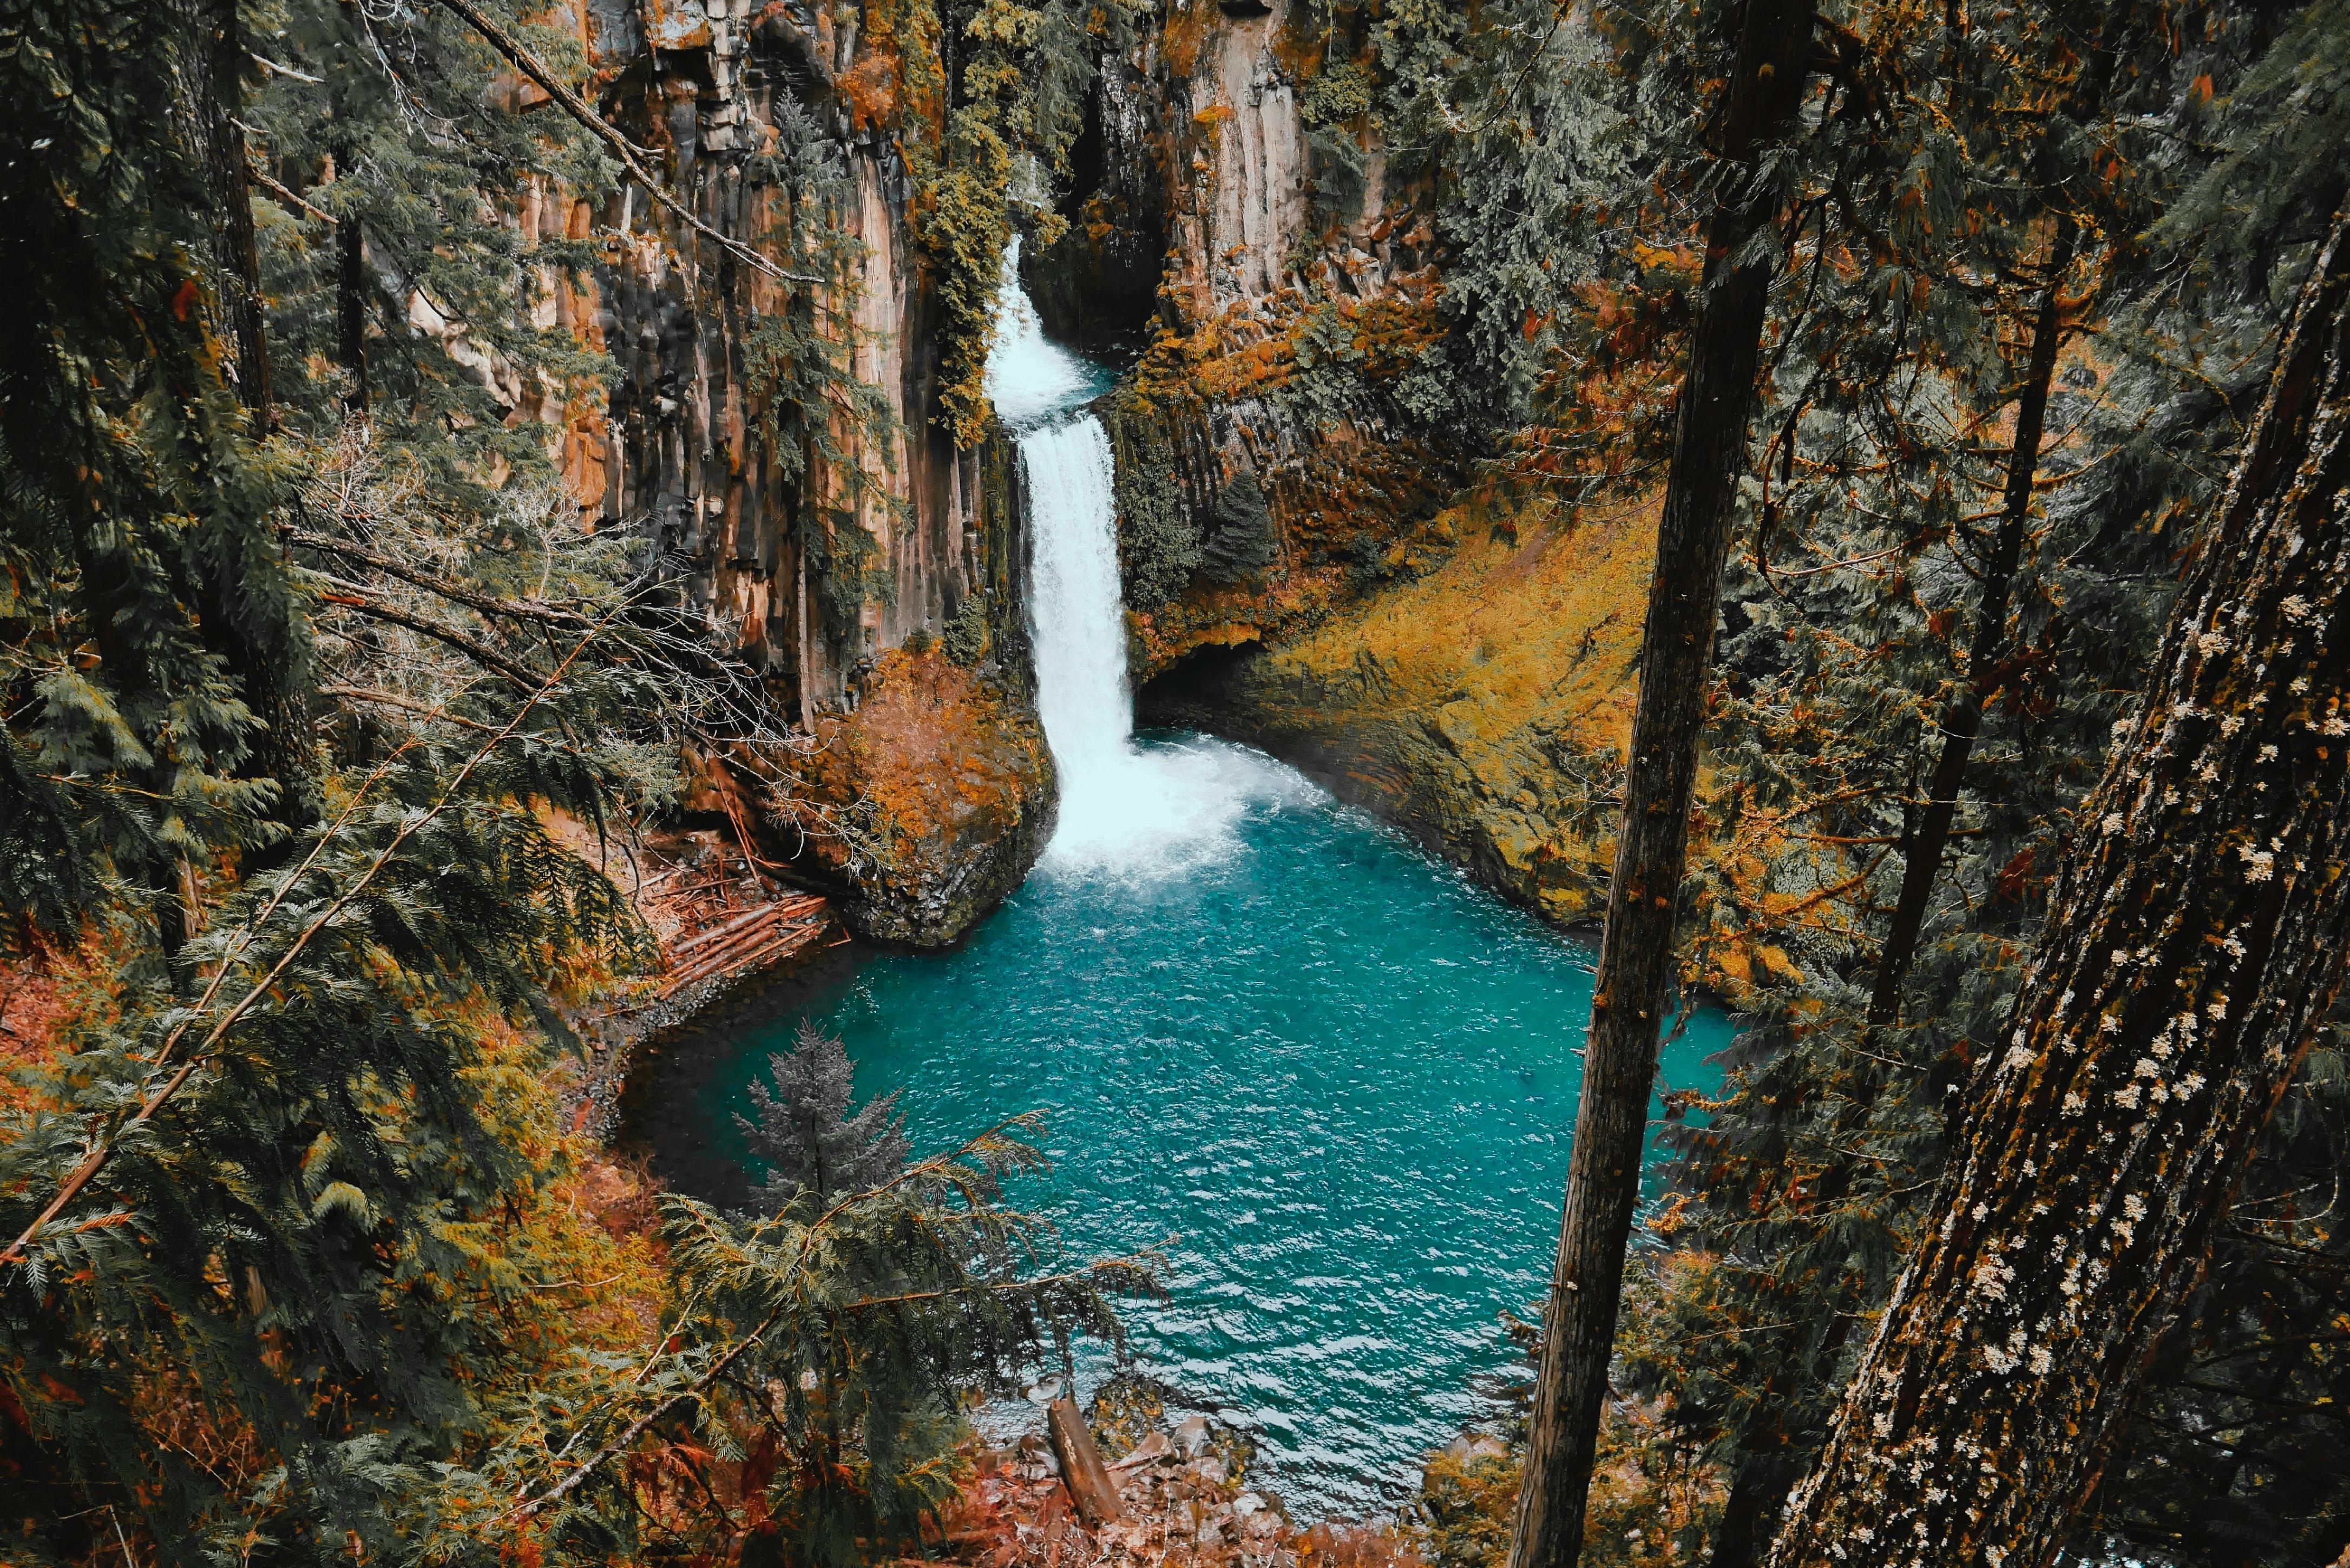 Ramboda Falls Tour 2